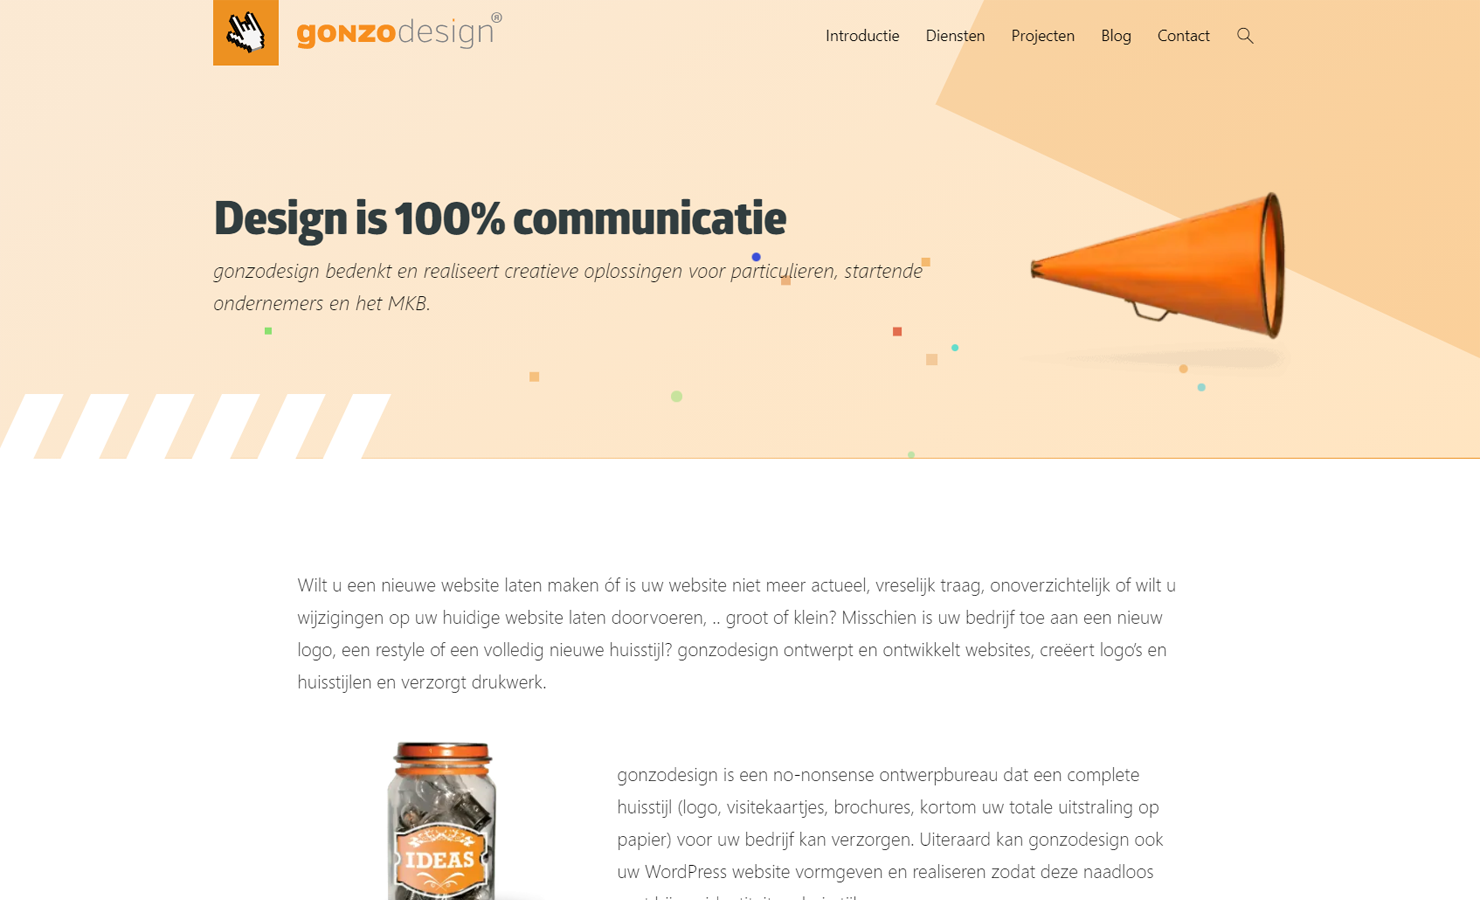 gonzodesign